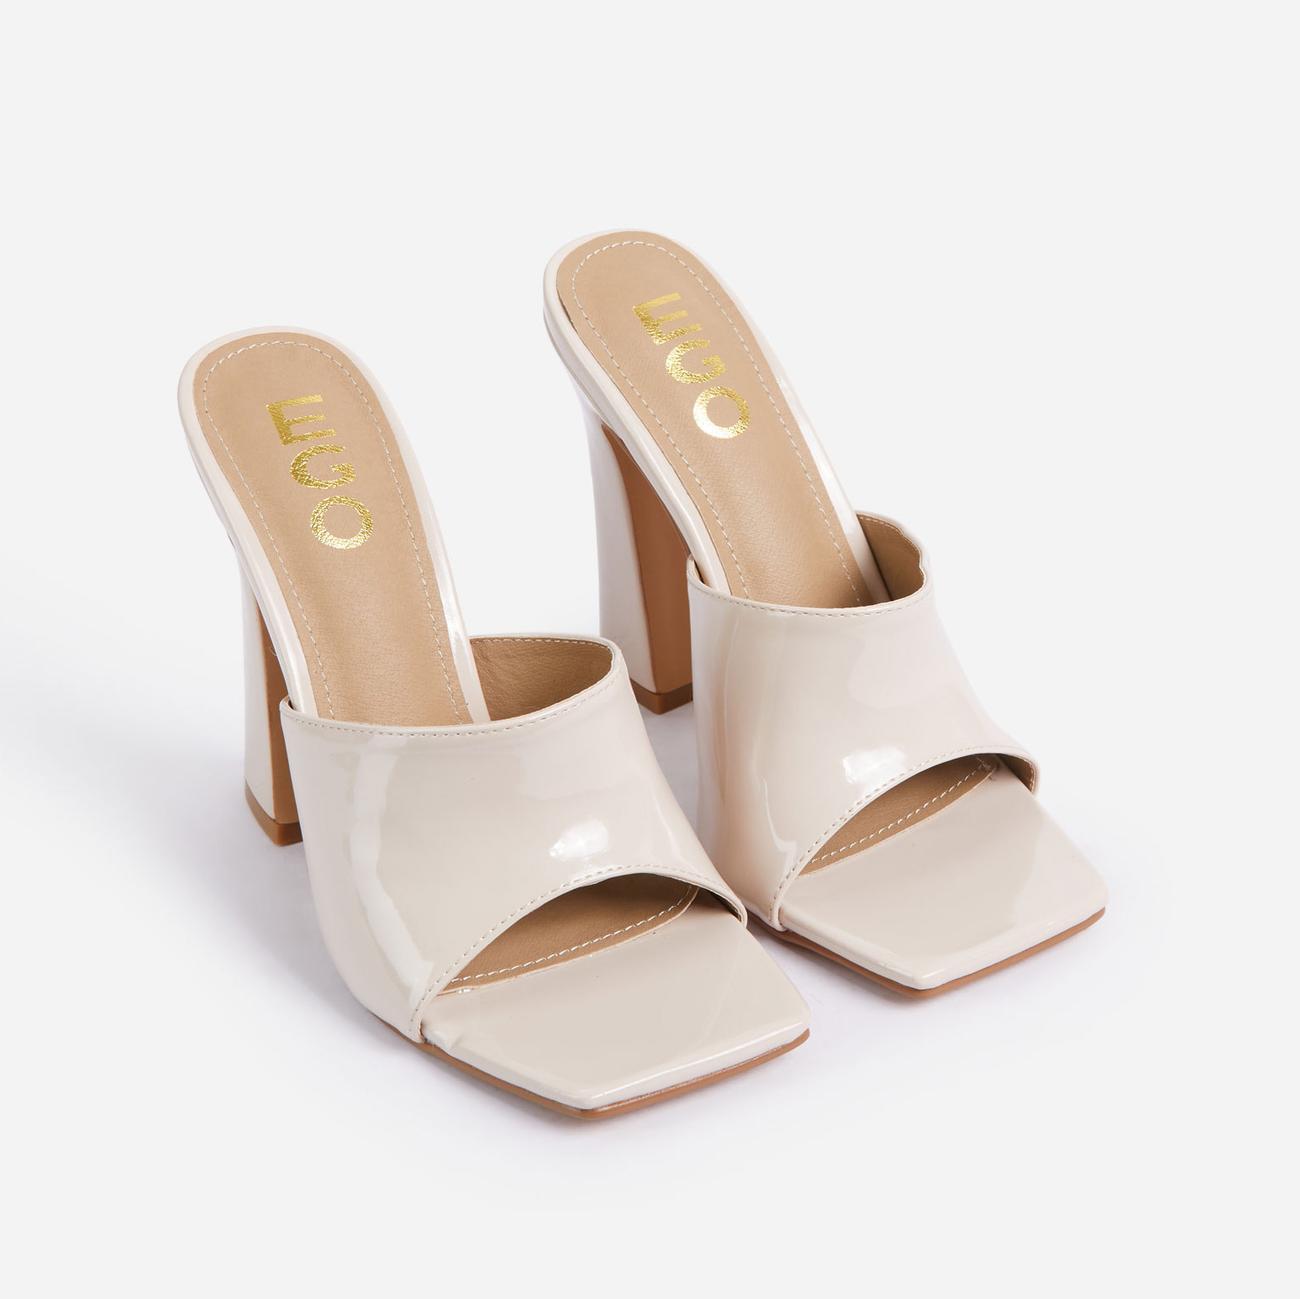 Begins Square Peep Toe Flared Block Heel Mule In Cream Patent Image 2